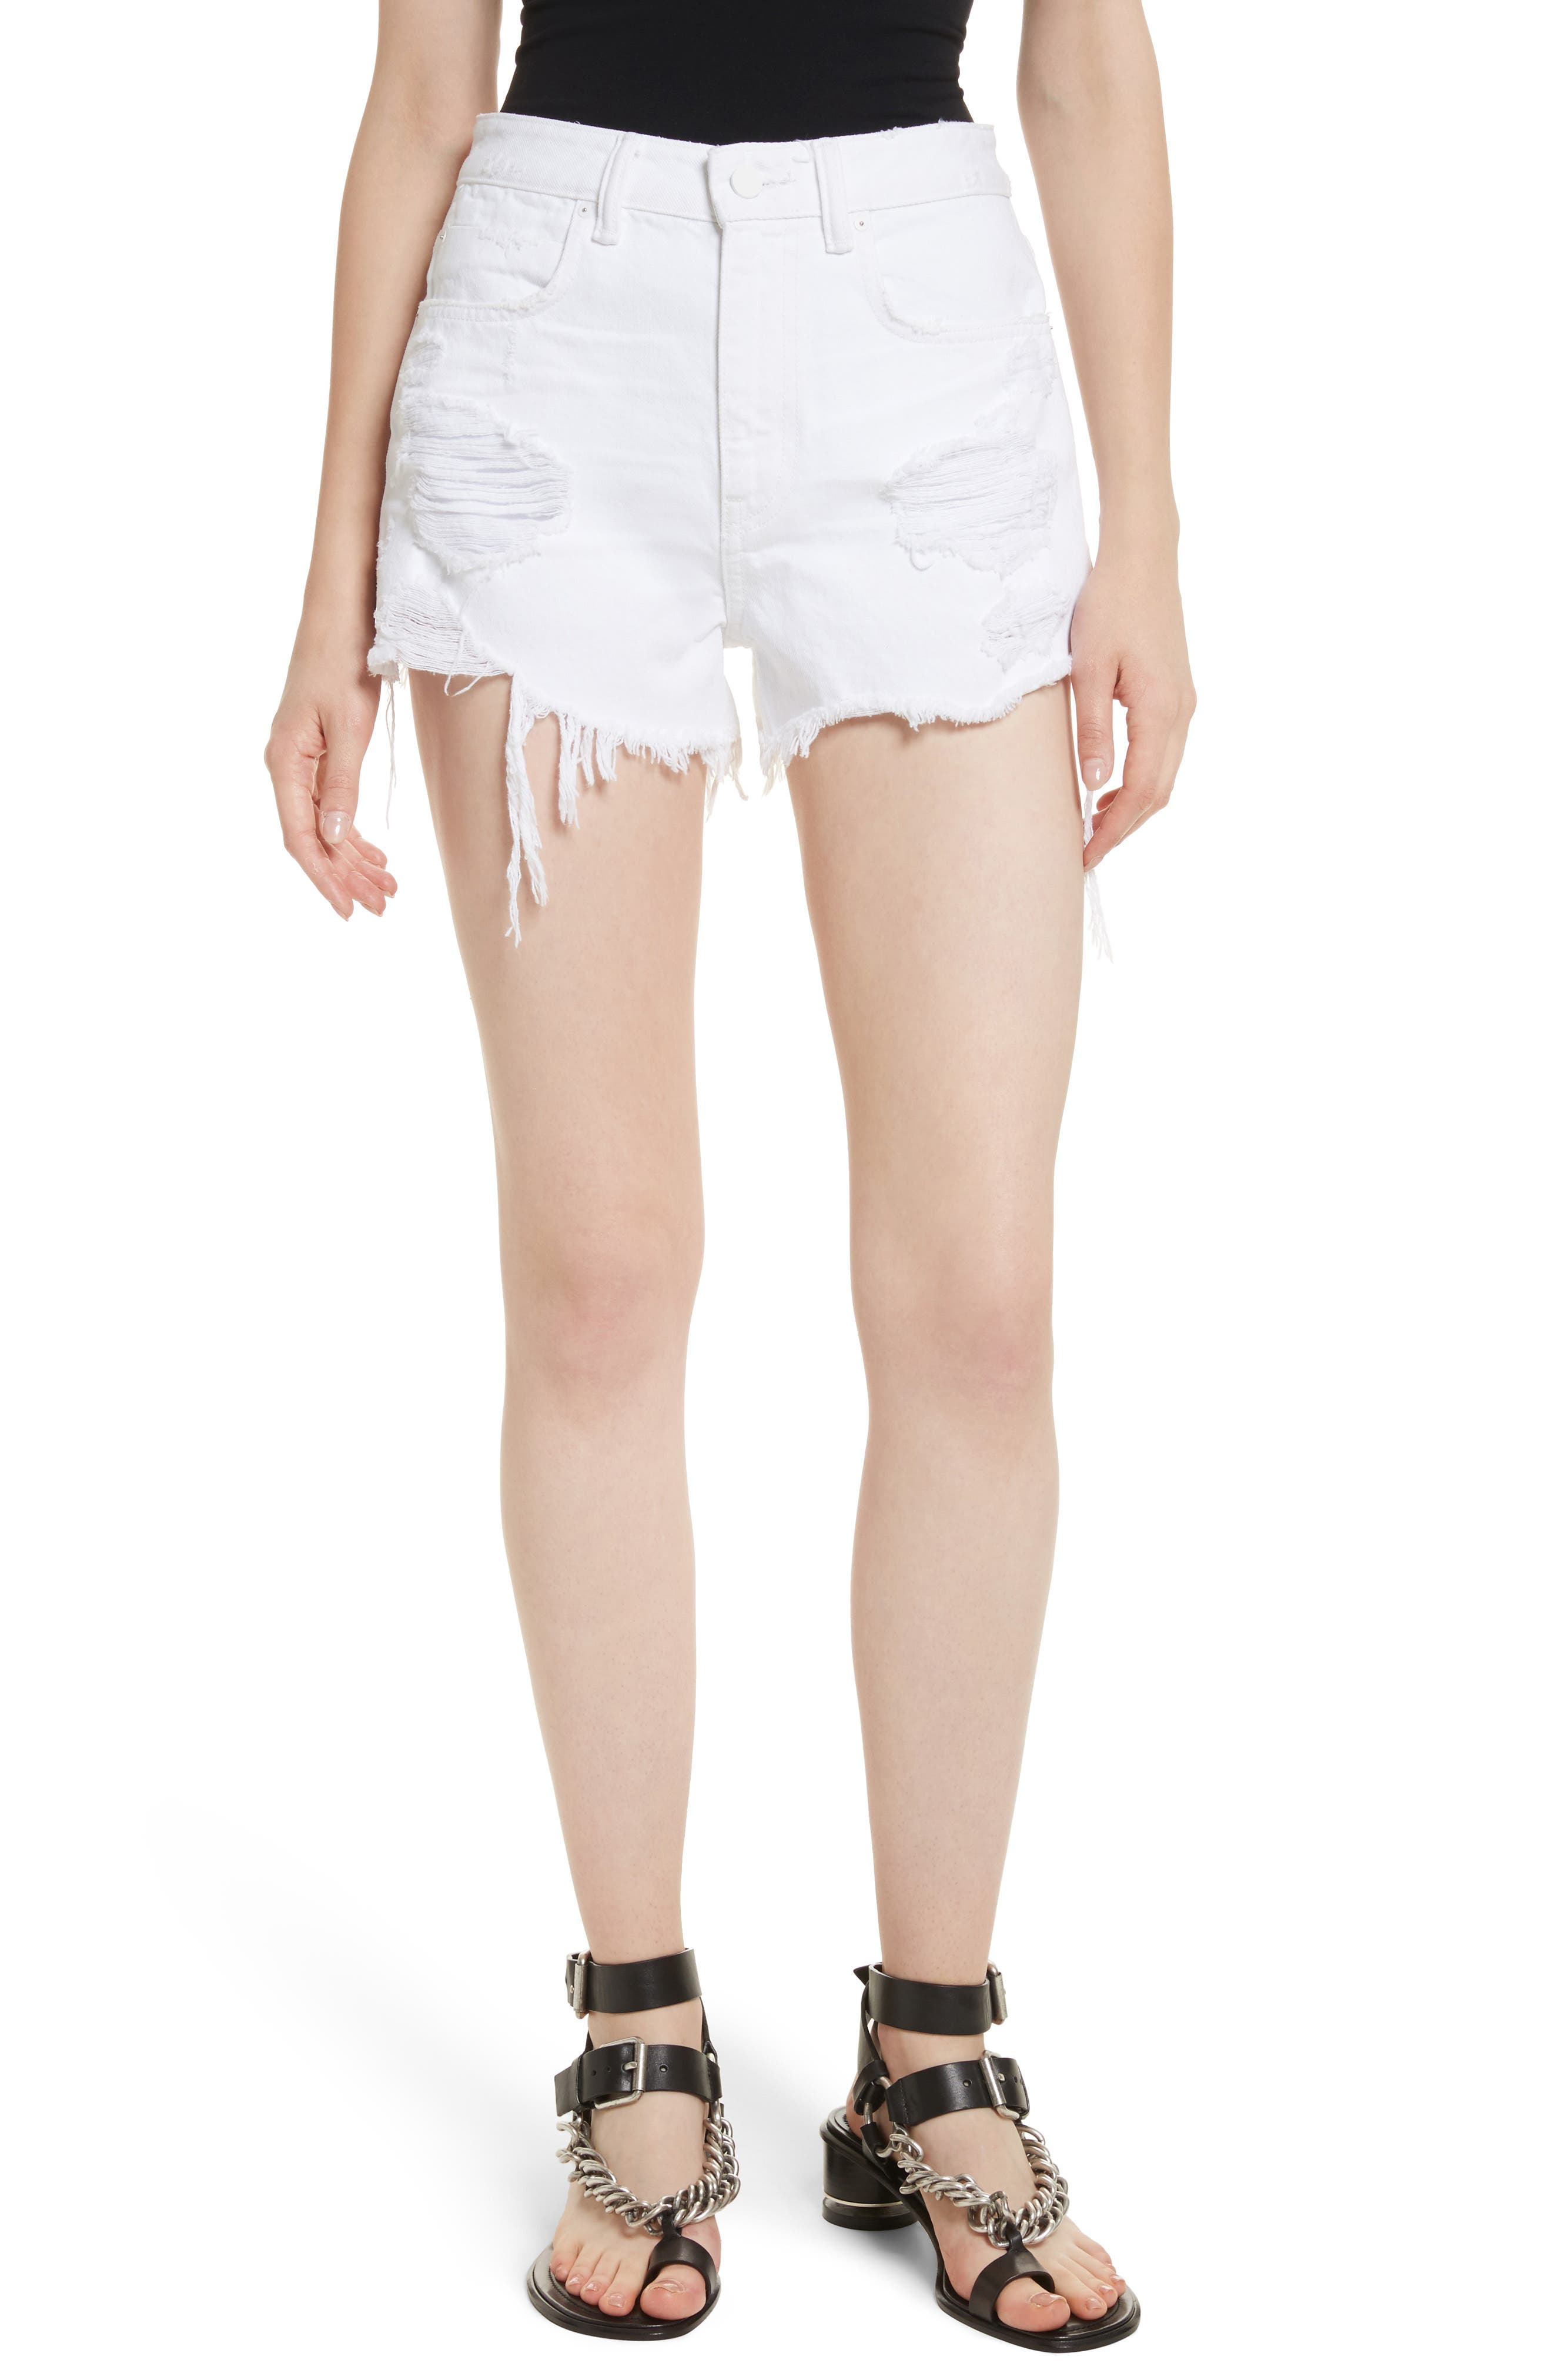 Bite White Ripped Denim Shorts,                         Main,                         color,